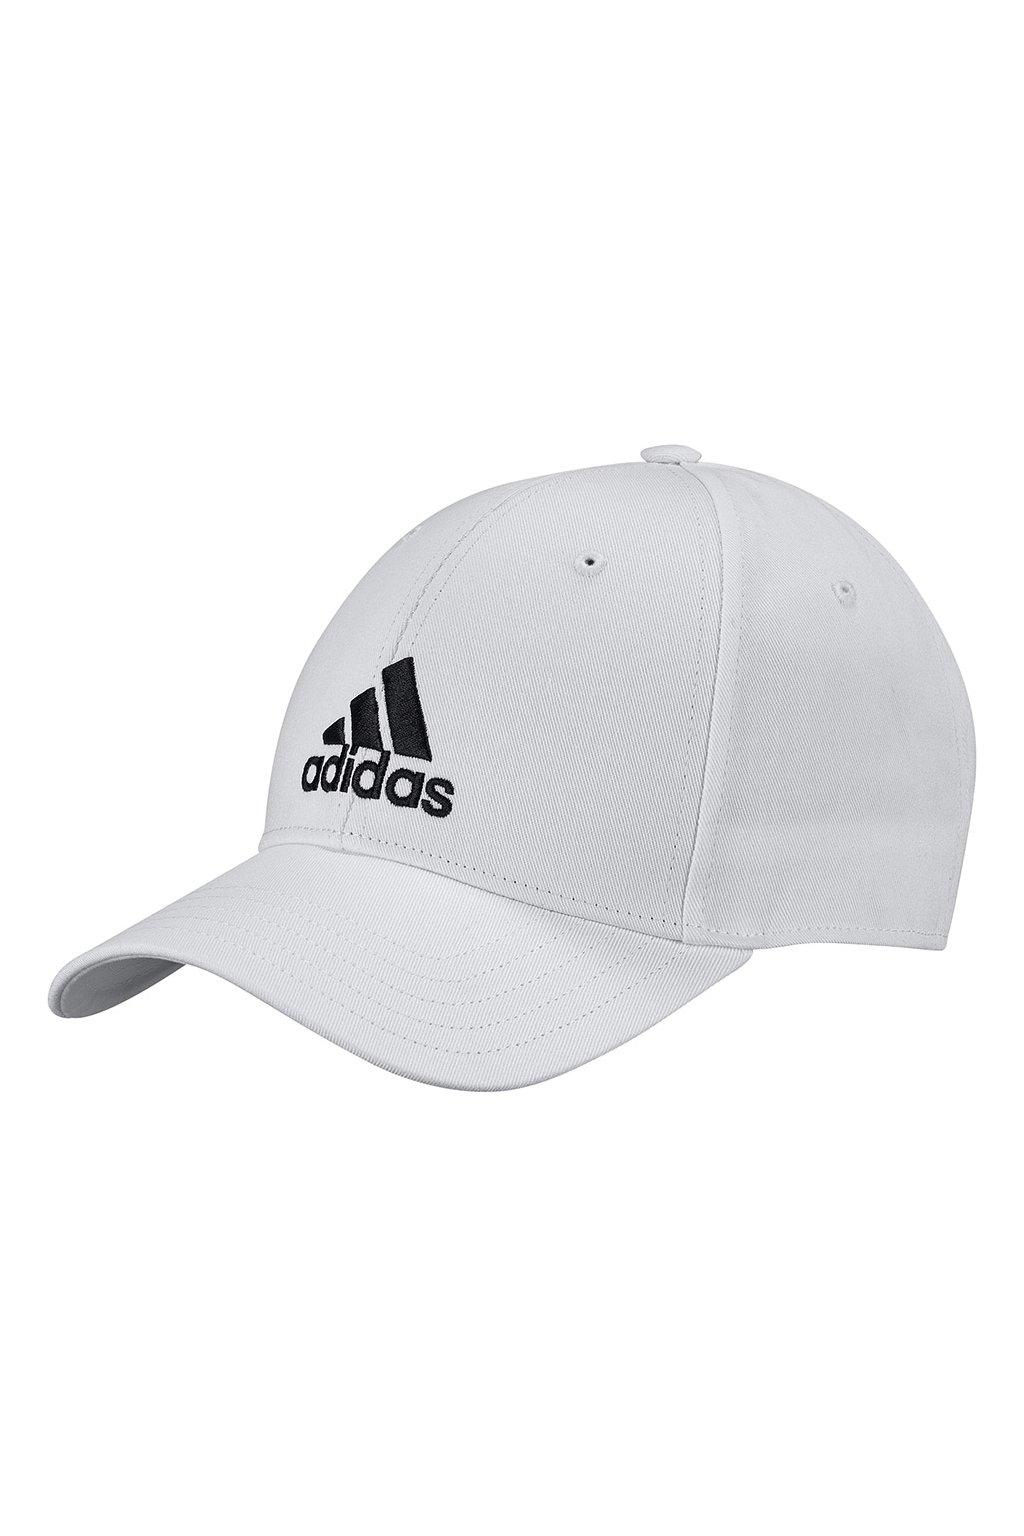 Pánska šiltovka Adidas Baseball OSFM biela FK0890